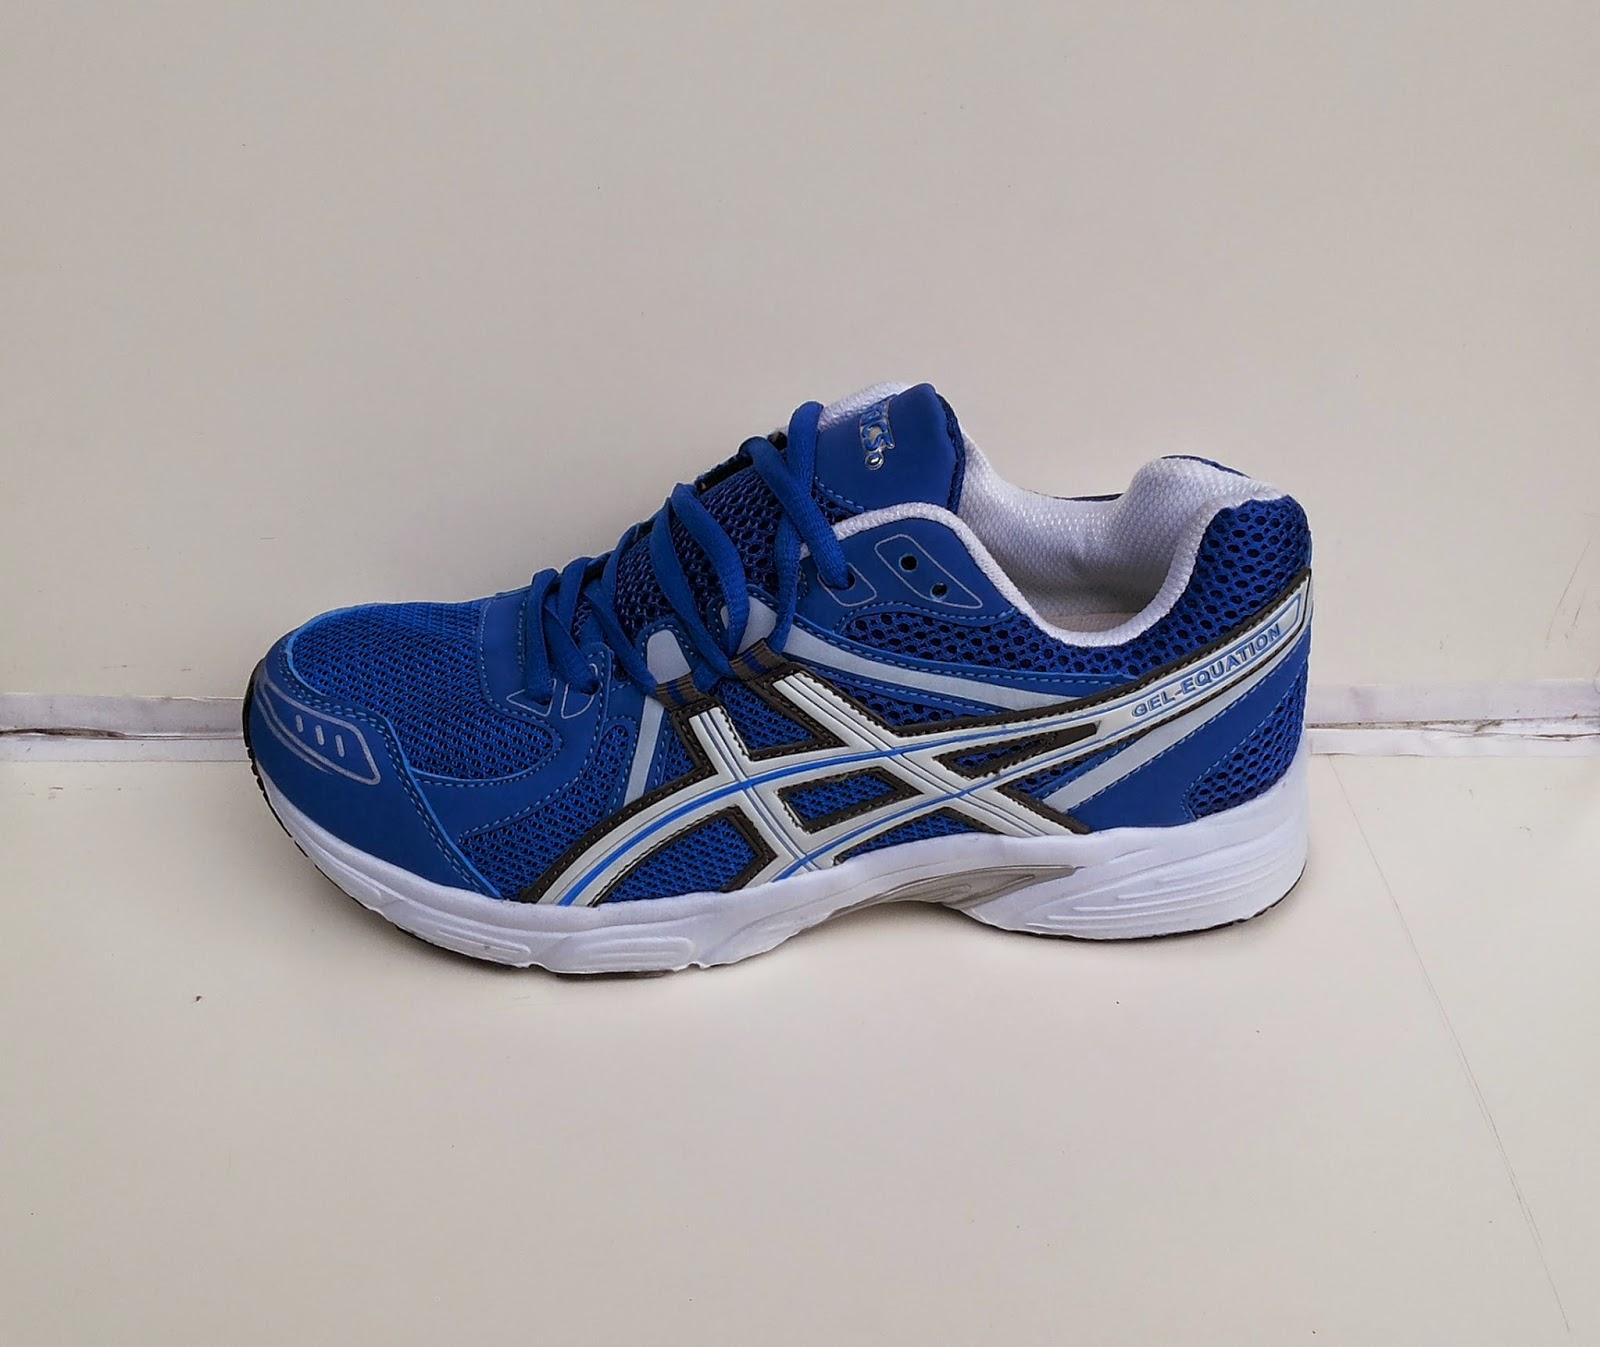 Sepatu Asics hitam murah,beli sepatu asics www.suppliersepatumurah.com